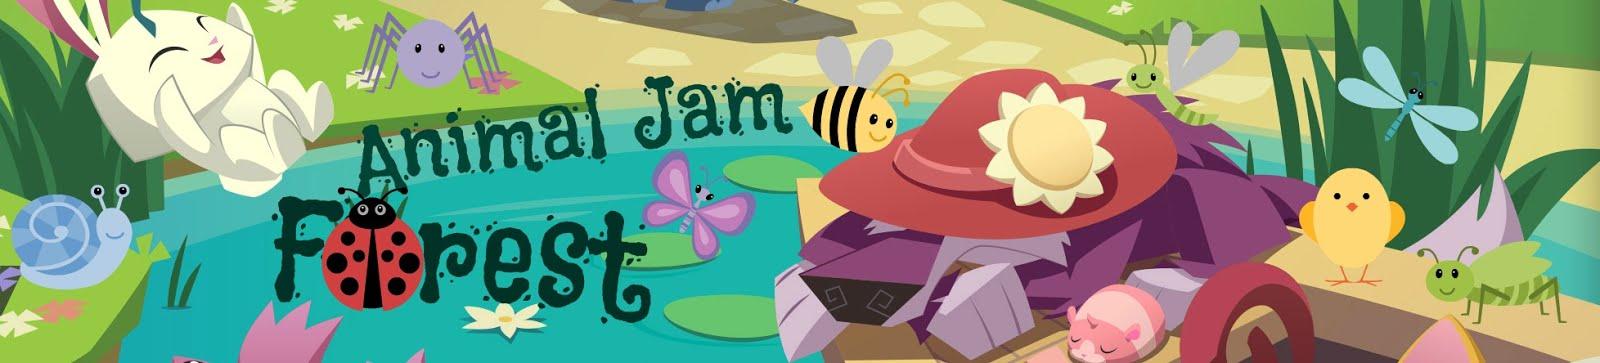 Animal Jam Forest